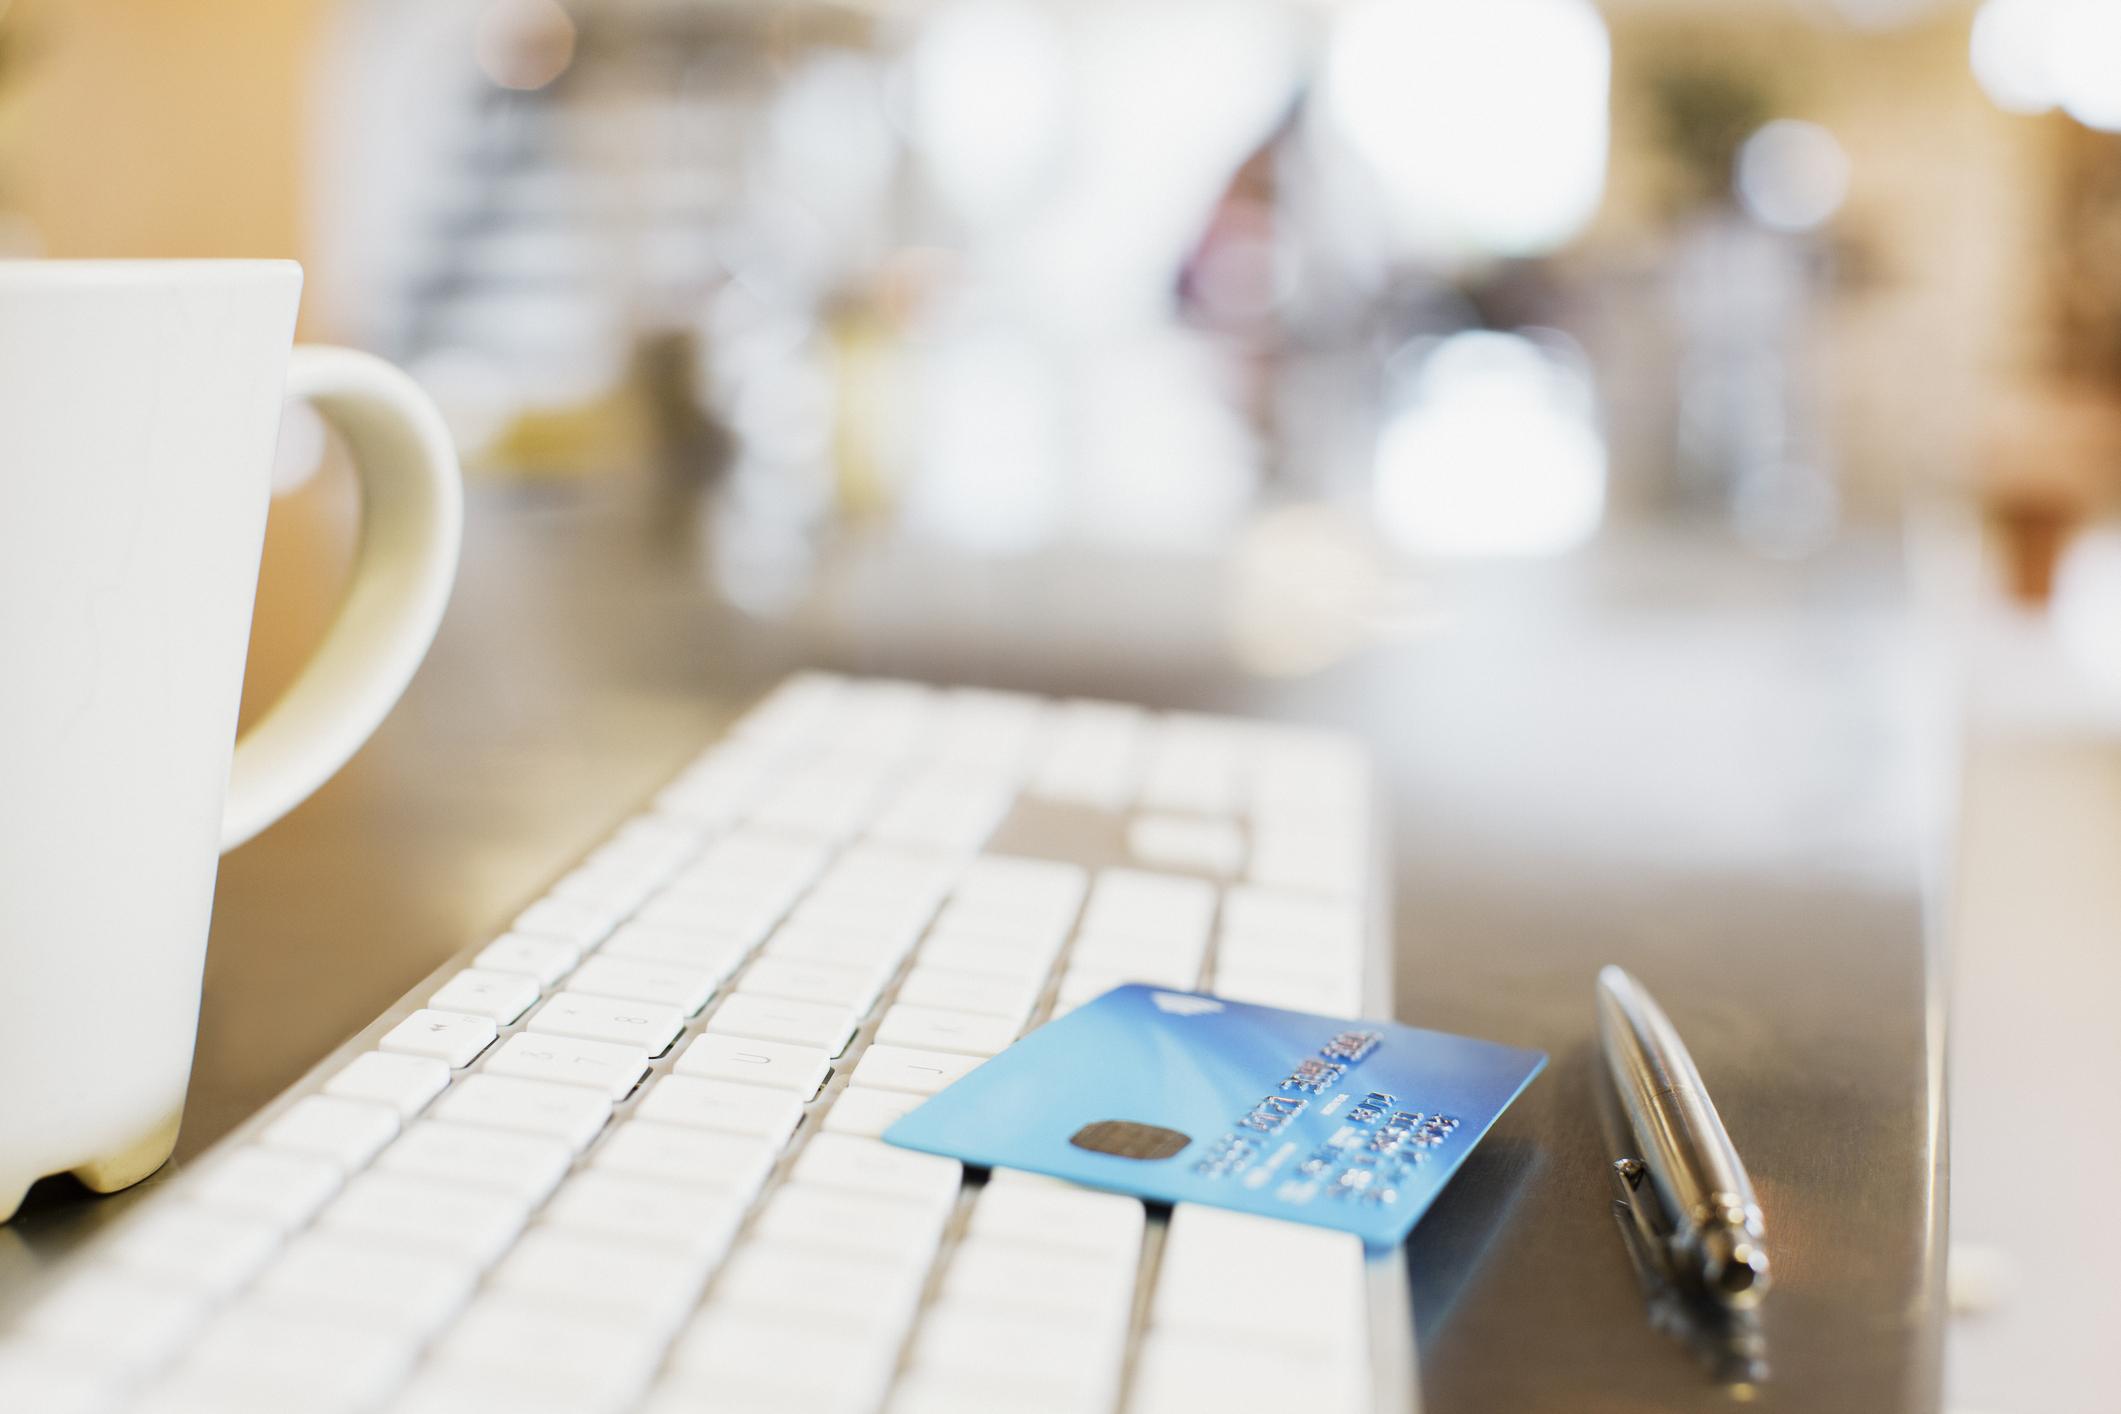 Bank card on a PC keyboard